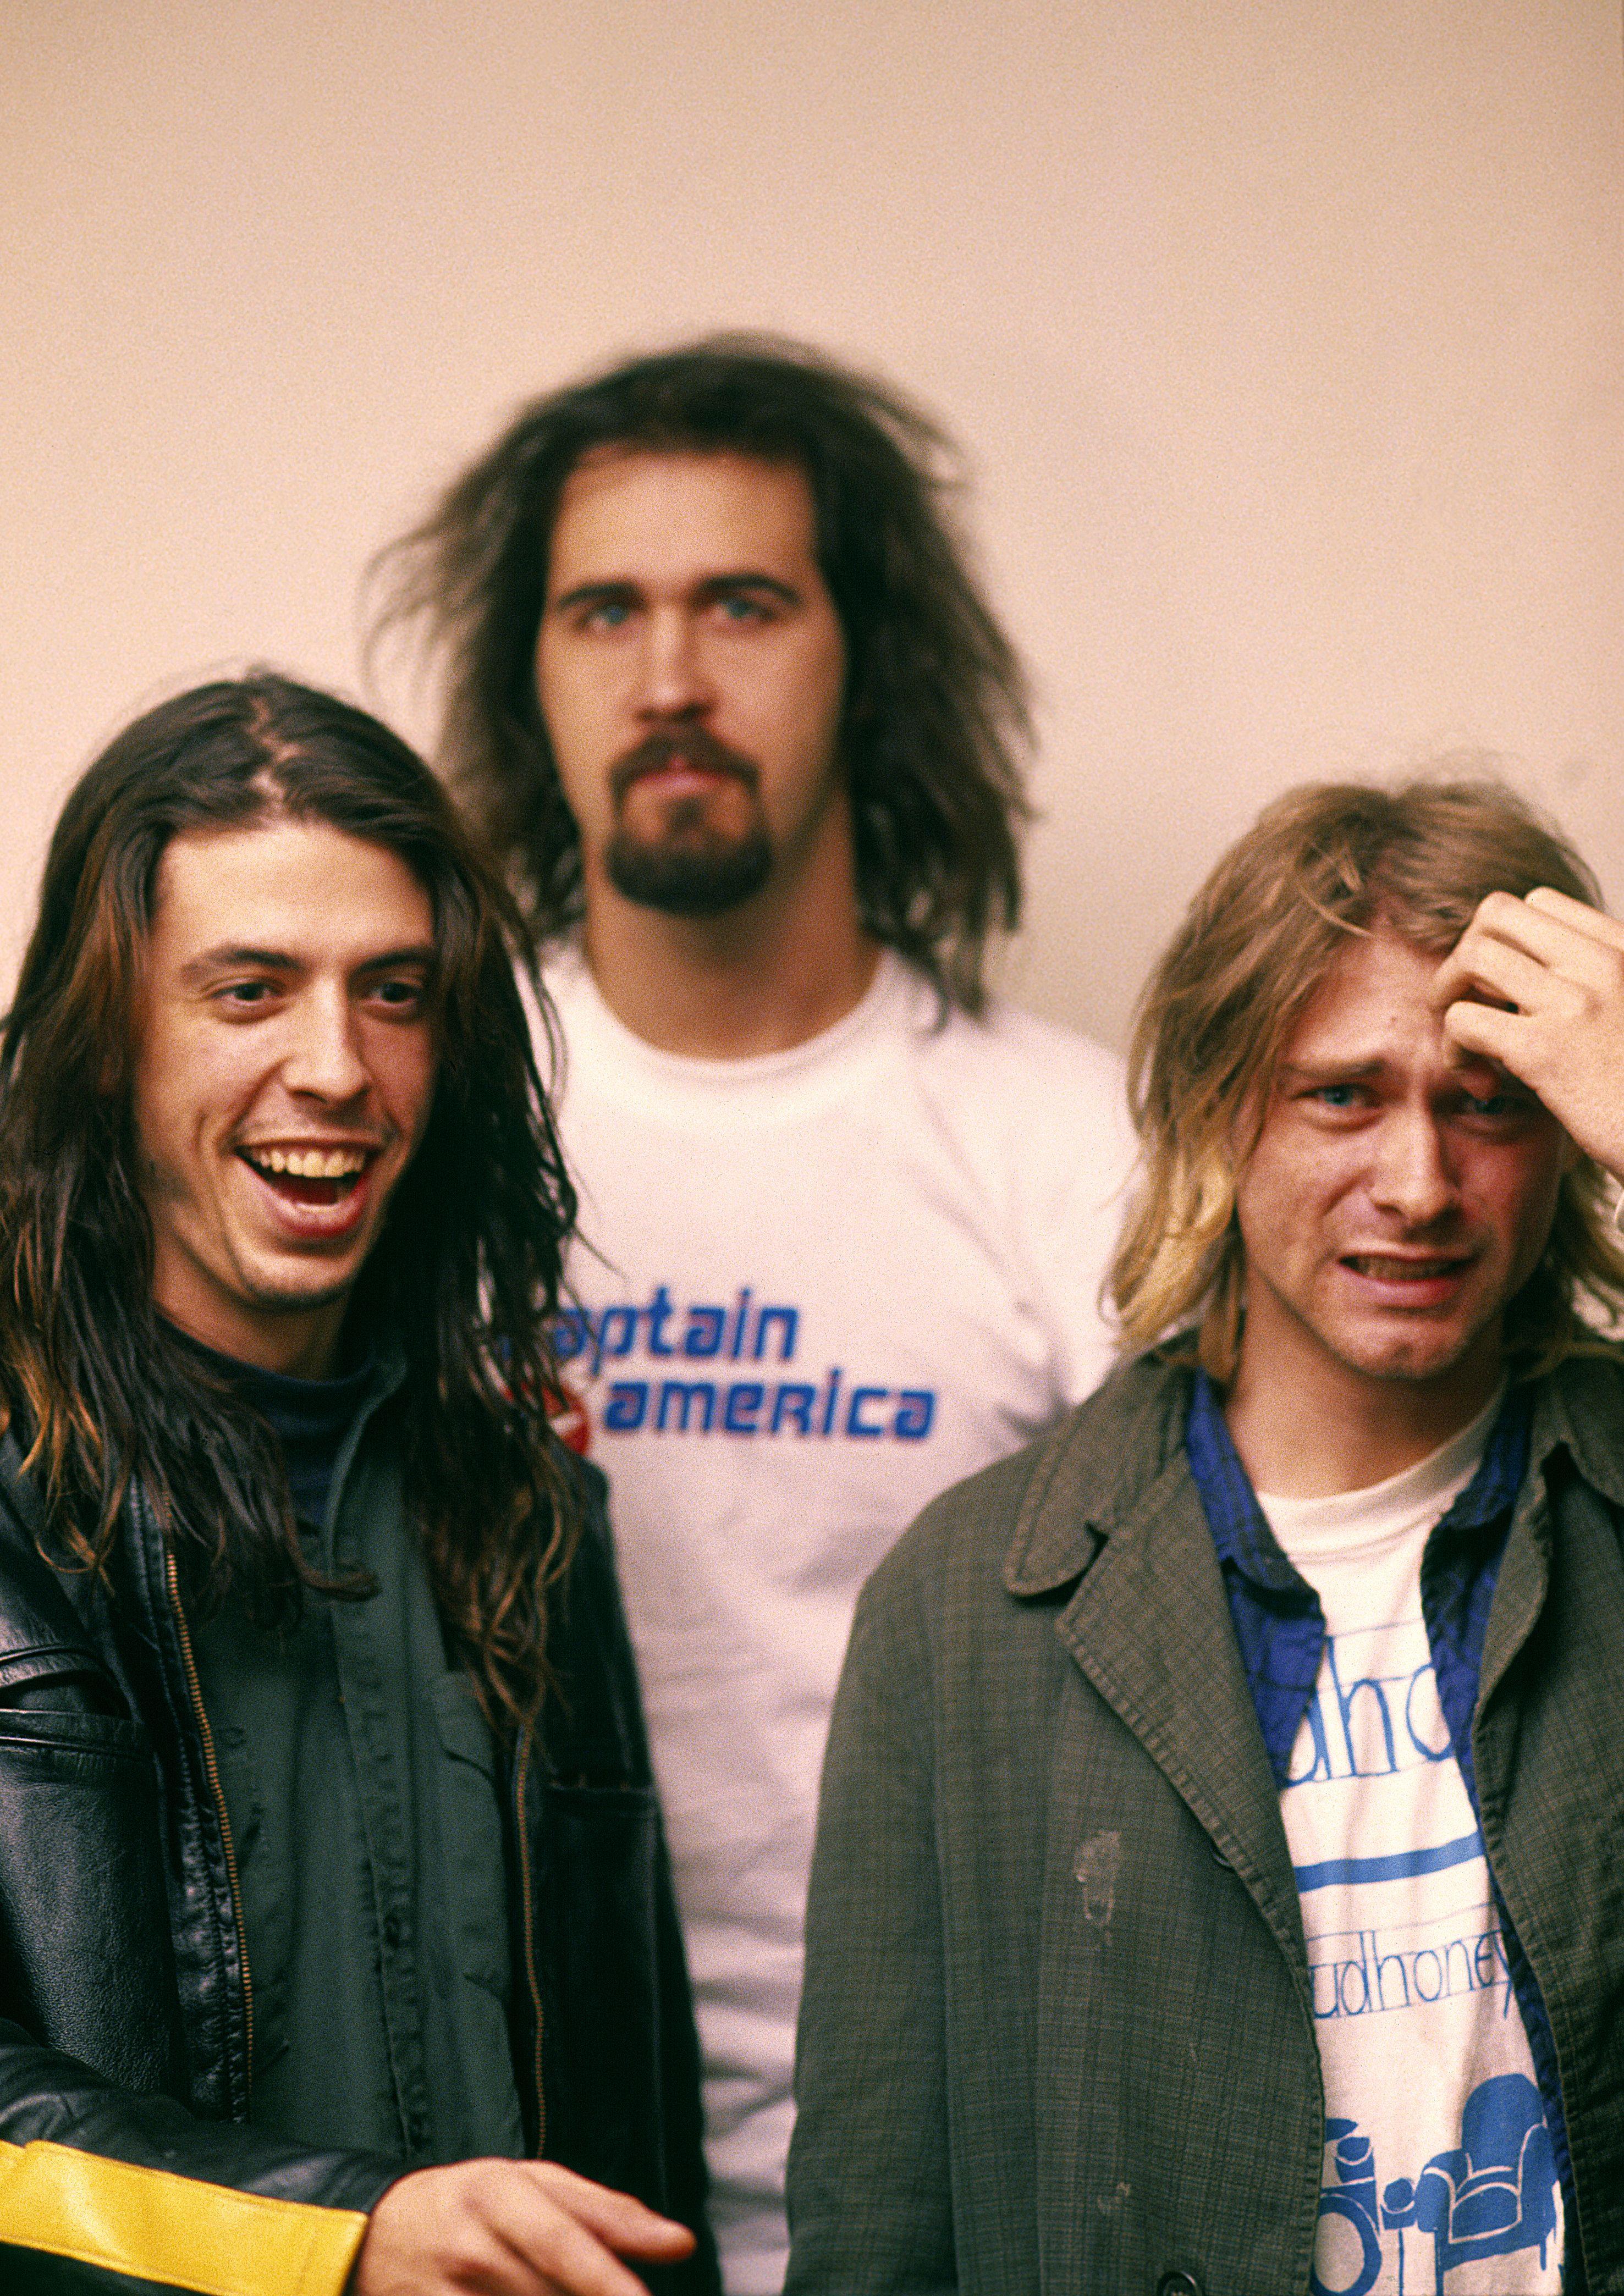 Nirvana 11 13 91 Munich Germany Nirvana Dave Grohl Nirvana Kurt [ 4176 x 2953 Pixel ]